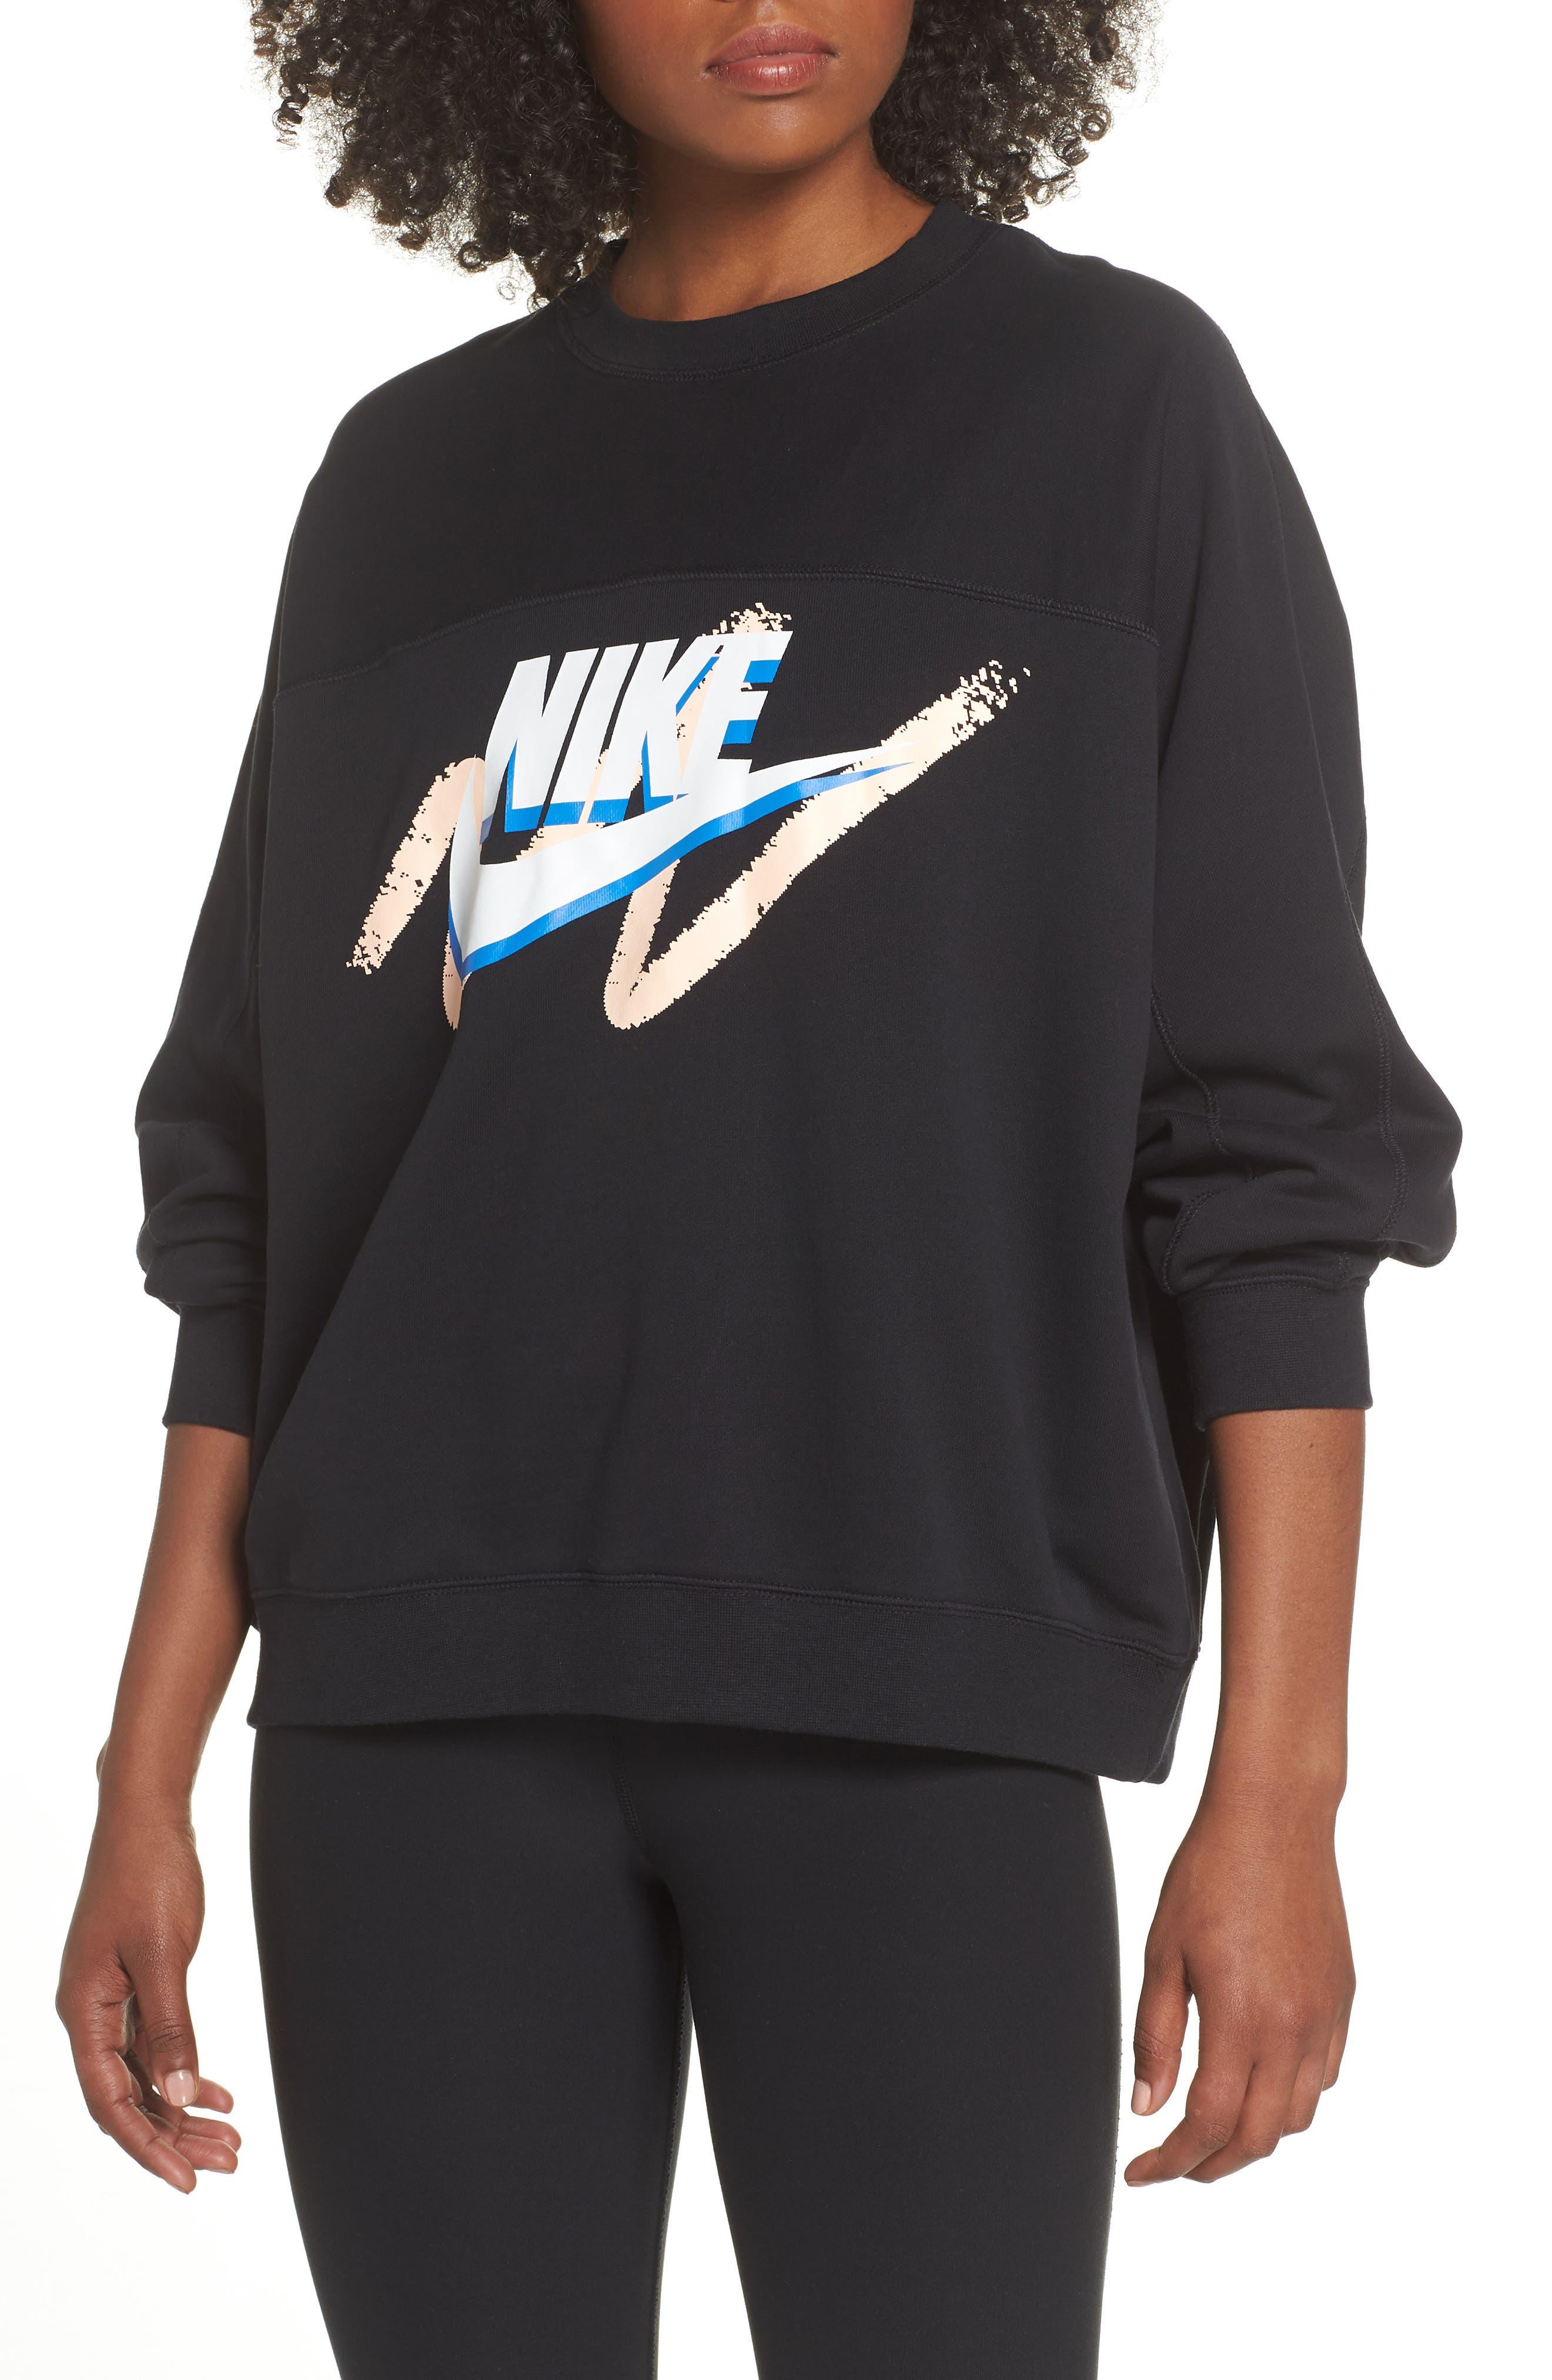 Archive Sweatshirt,                             Main thumbnail 1, color,                             BLACK/ BLACK/ BLACK